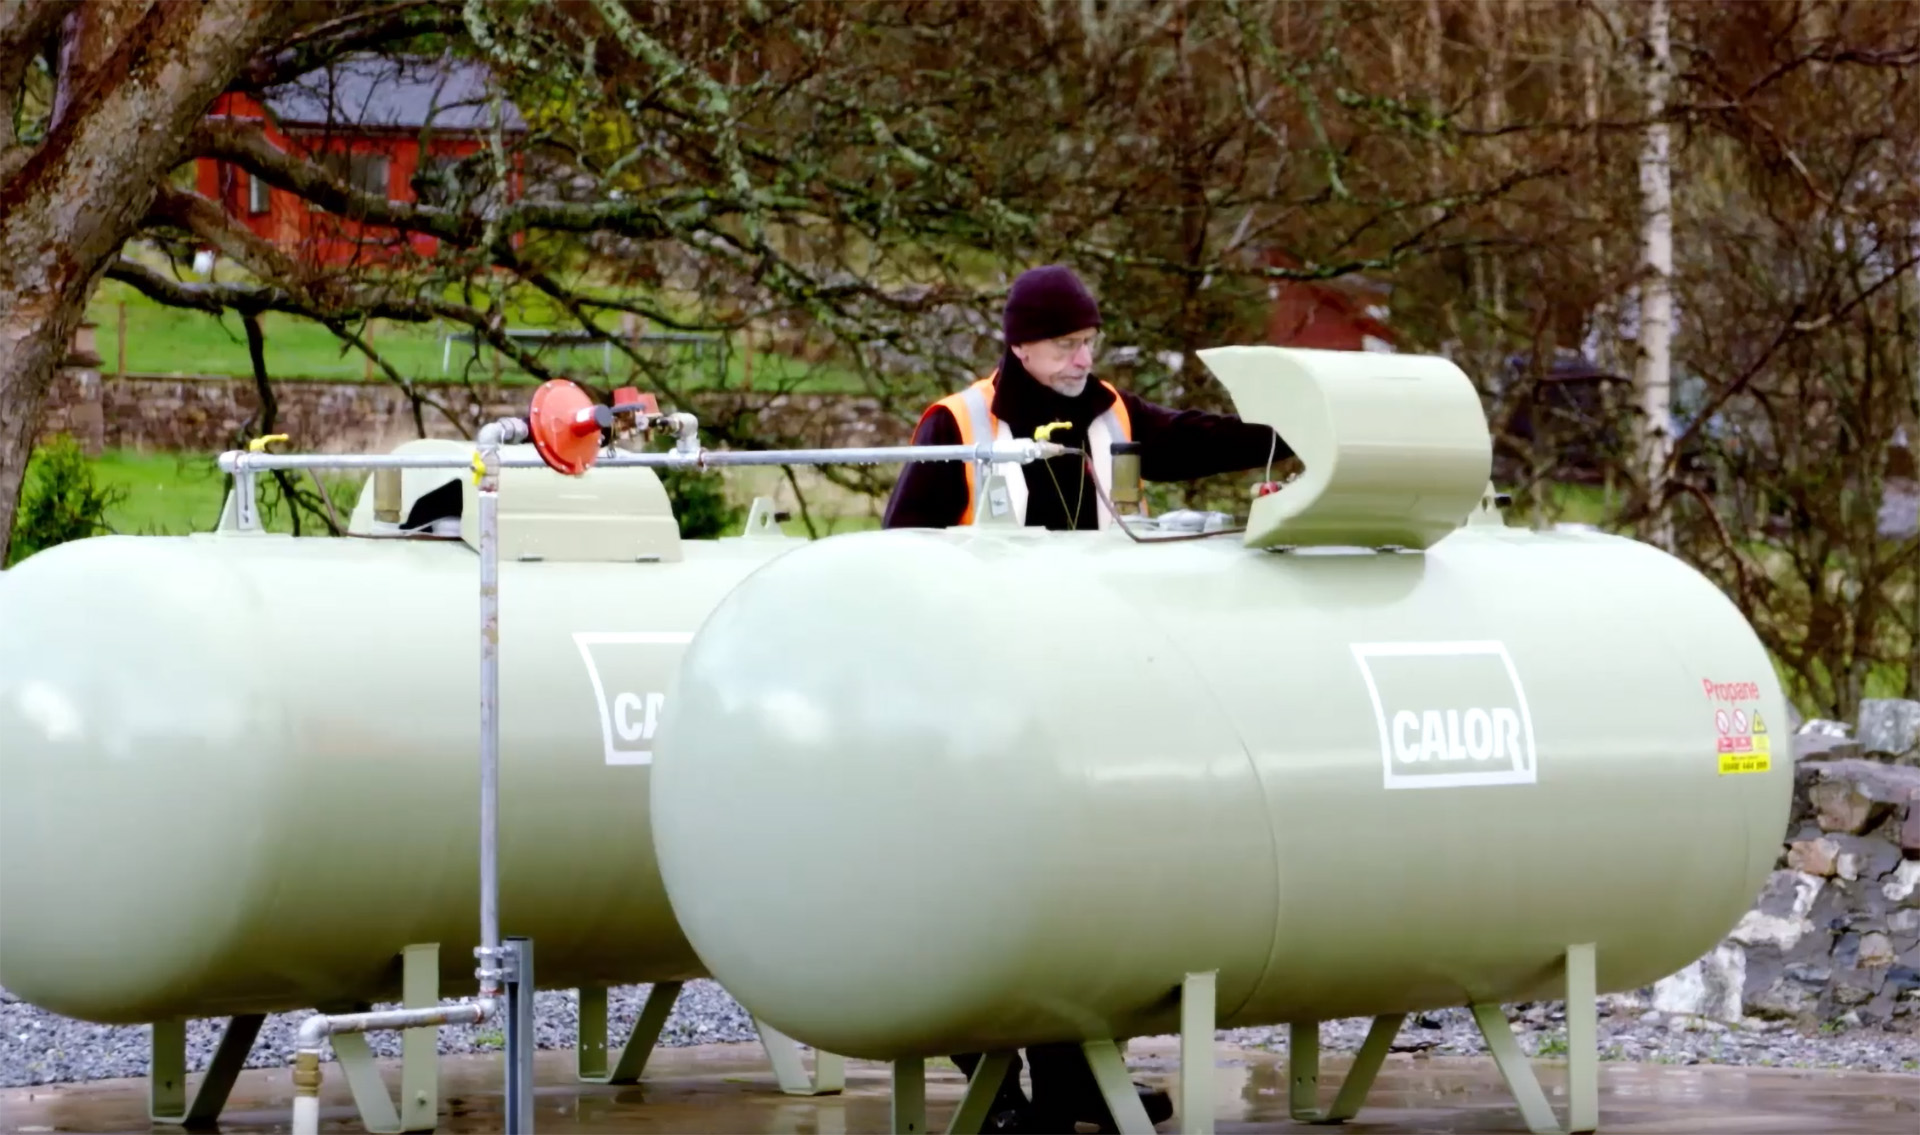 Calor employee inspecting Calor LPG bulk tank